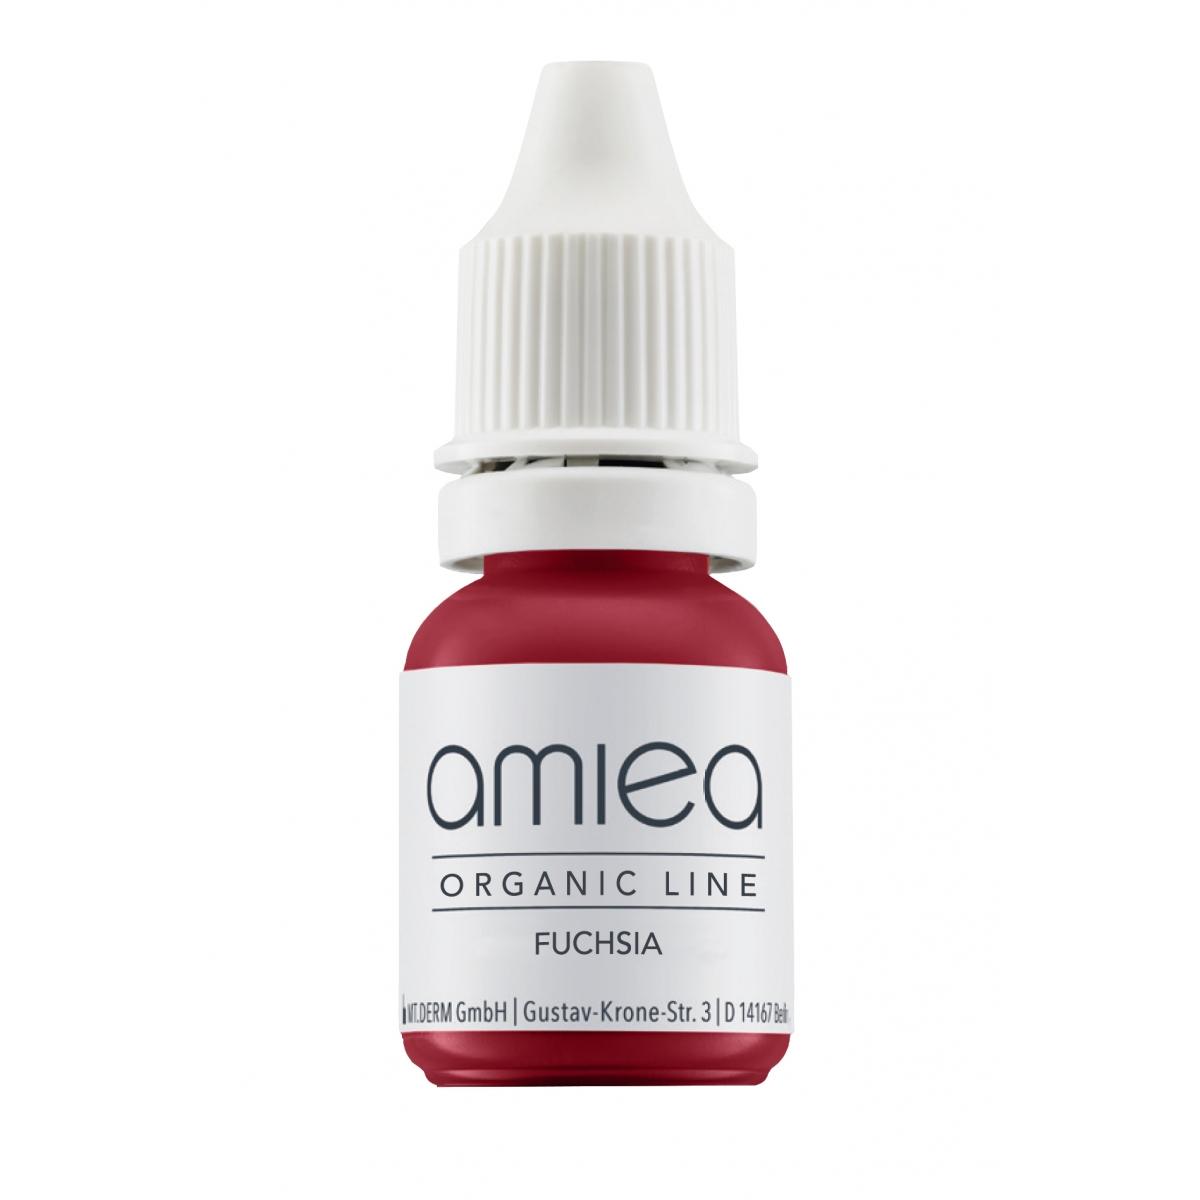 ORGANIC LINE (5ml)  - PIGMENT FUSCHIA ORGANICLINE AMIEA (5 ml)